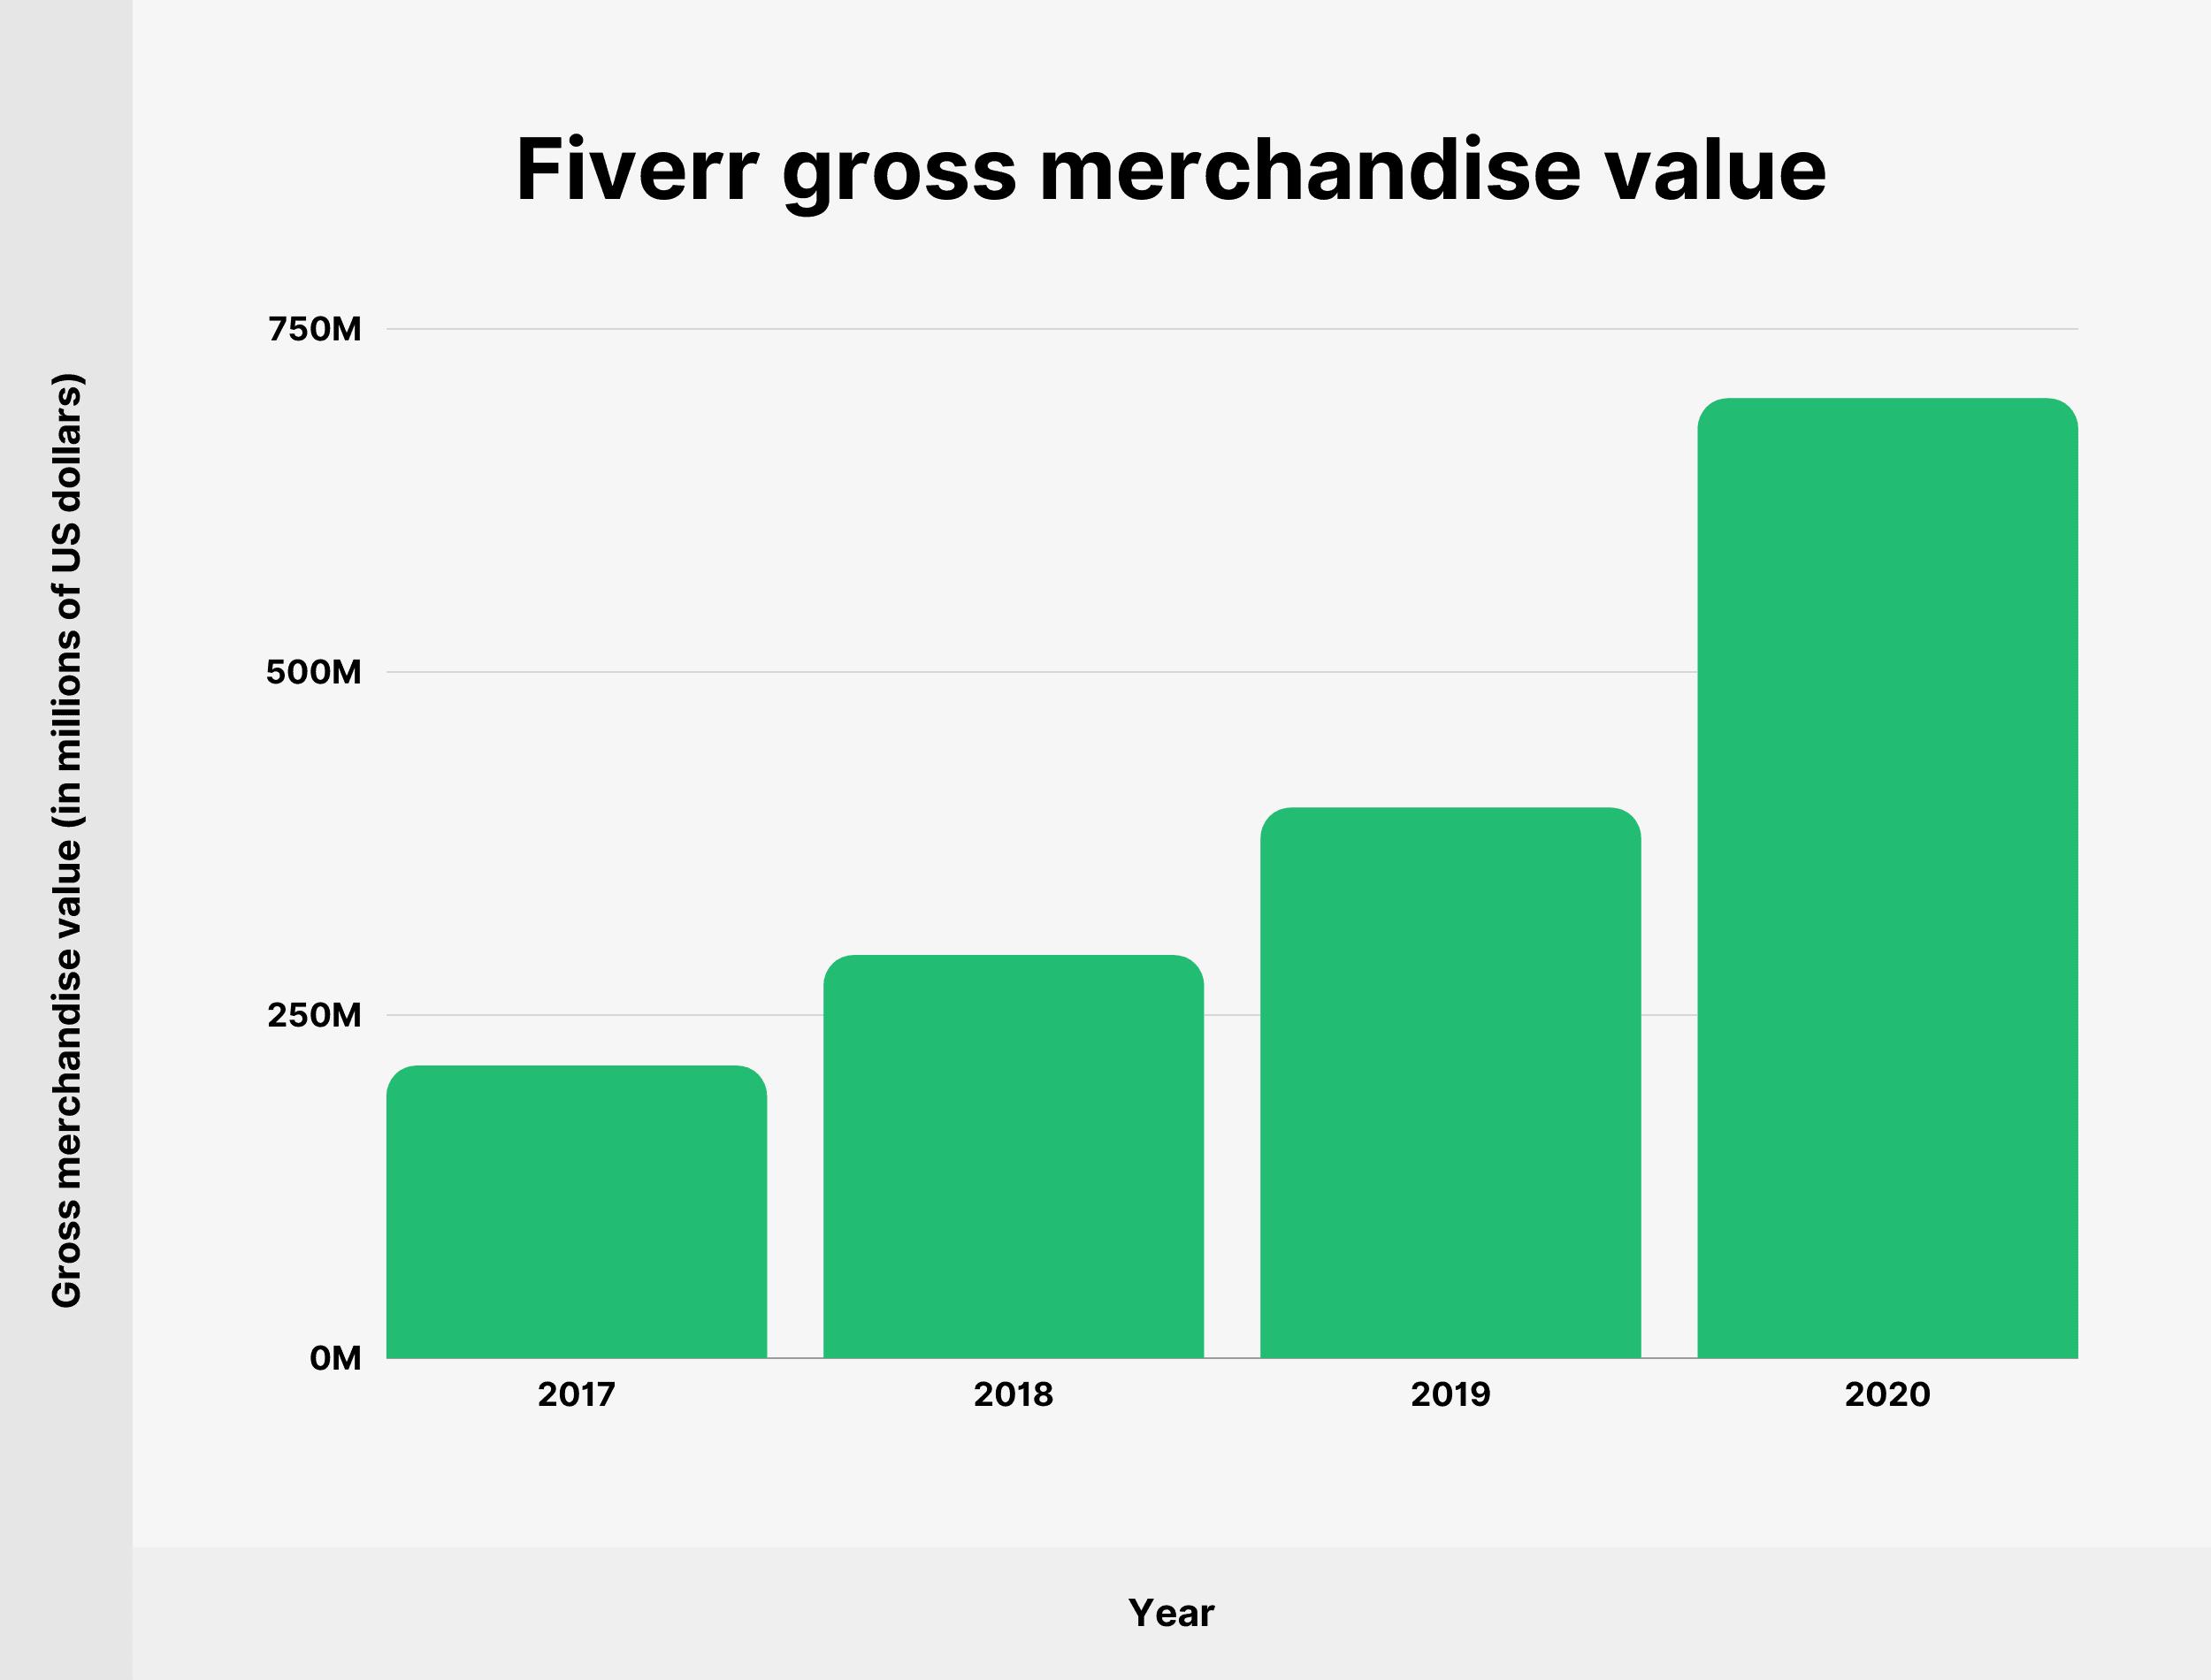 Fiverr gross merchandise value